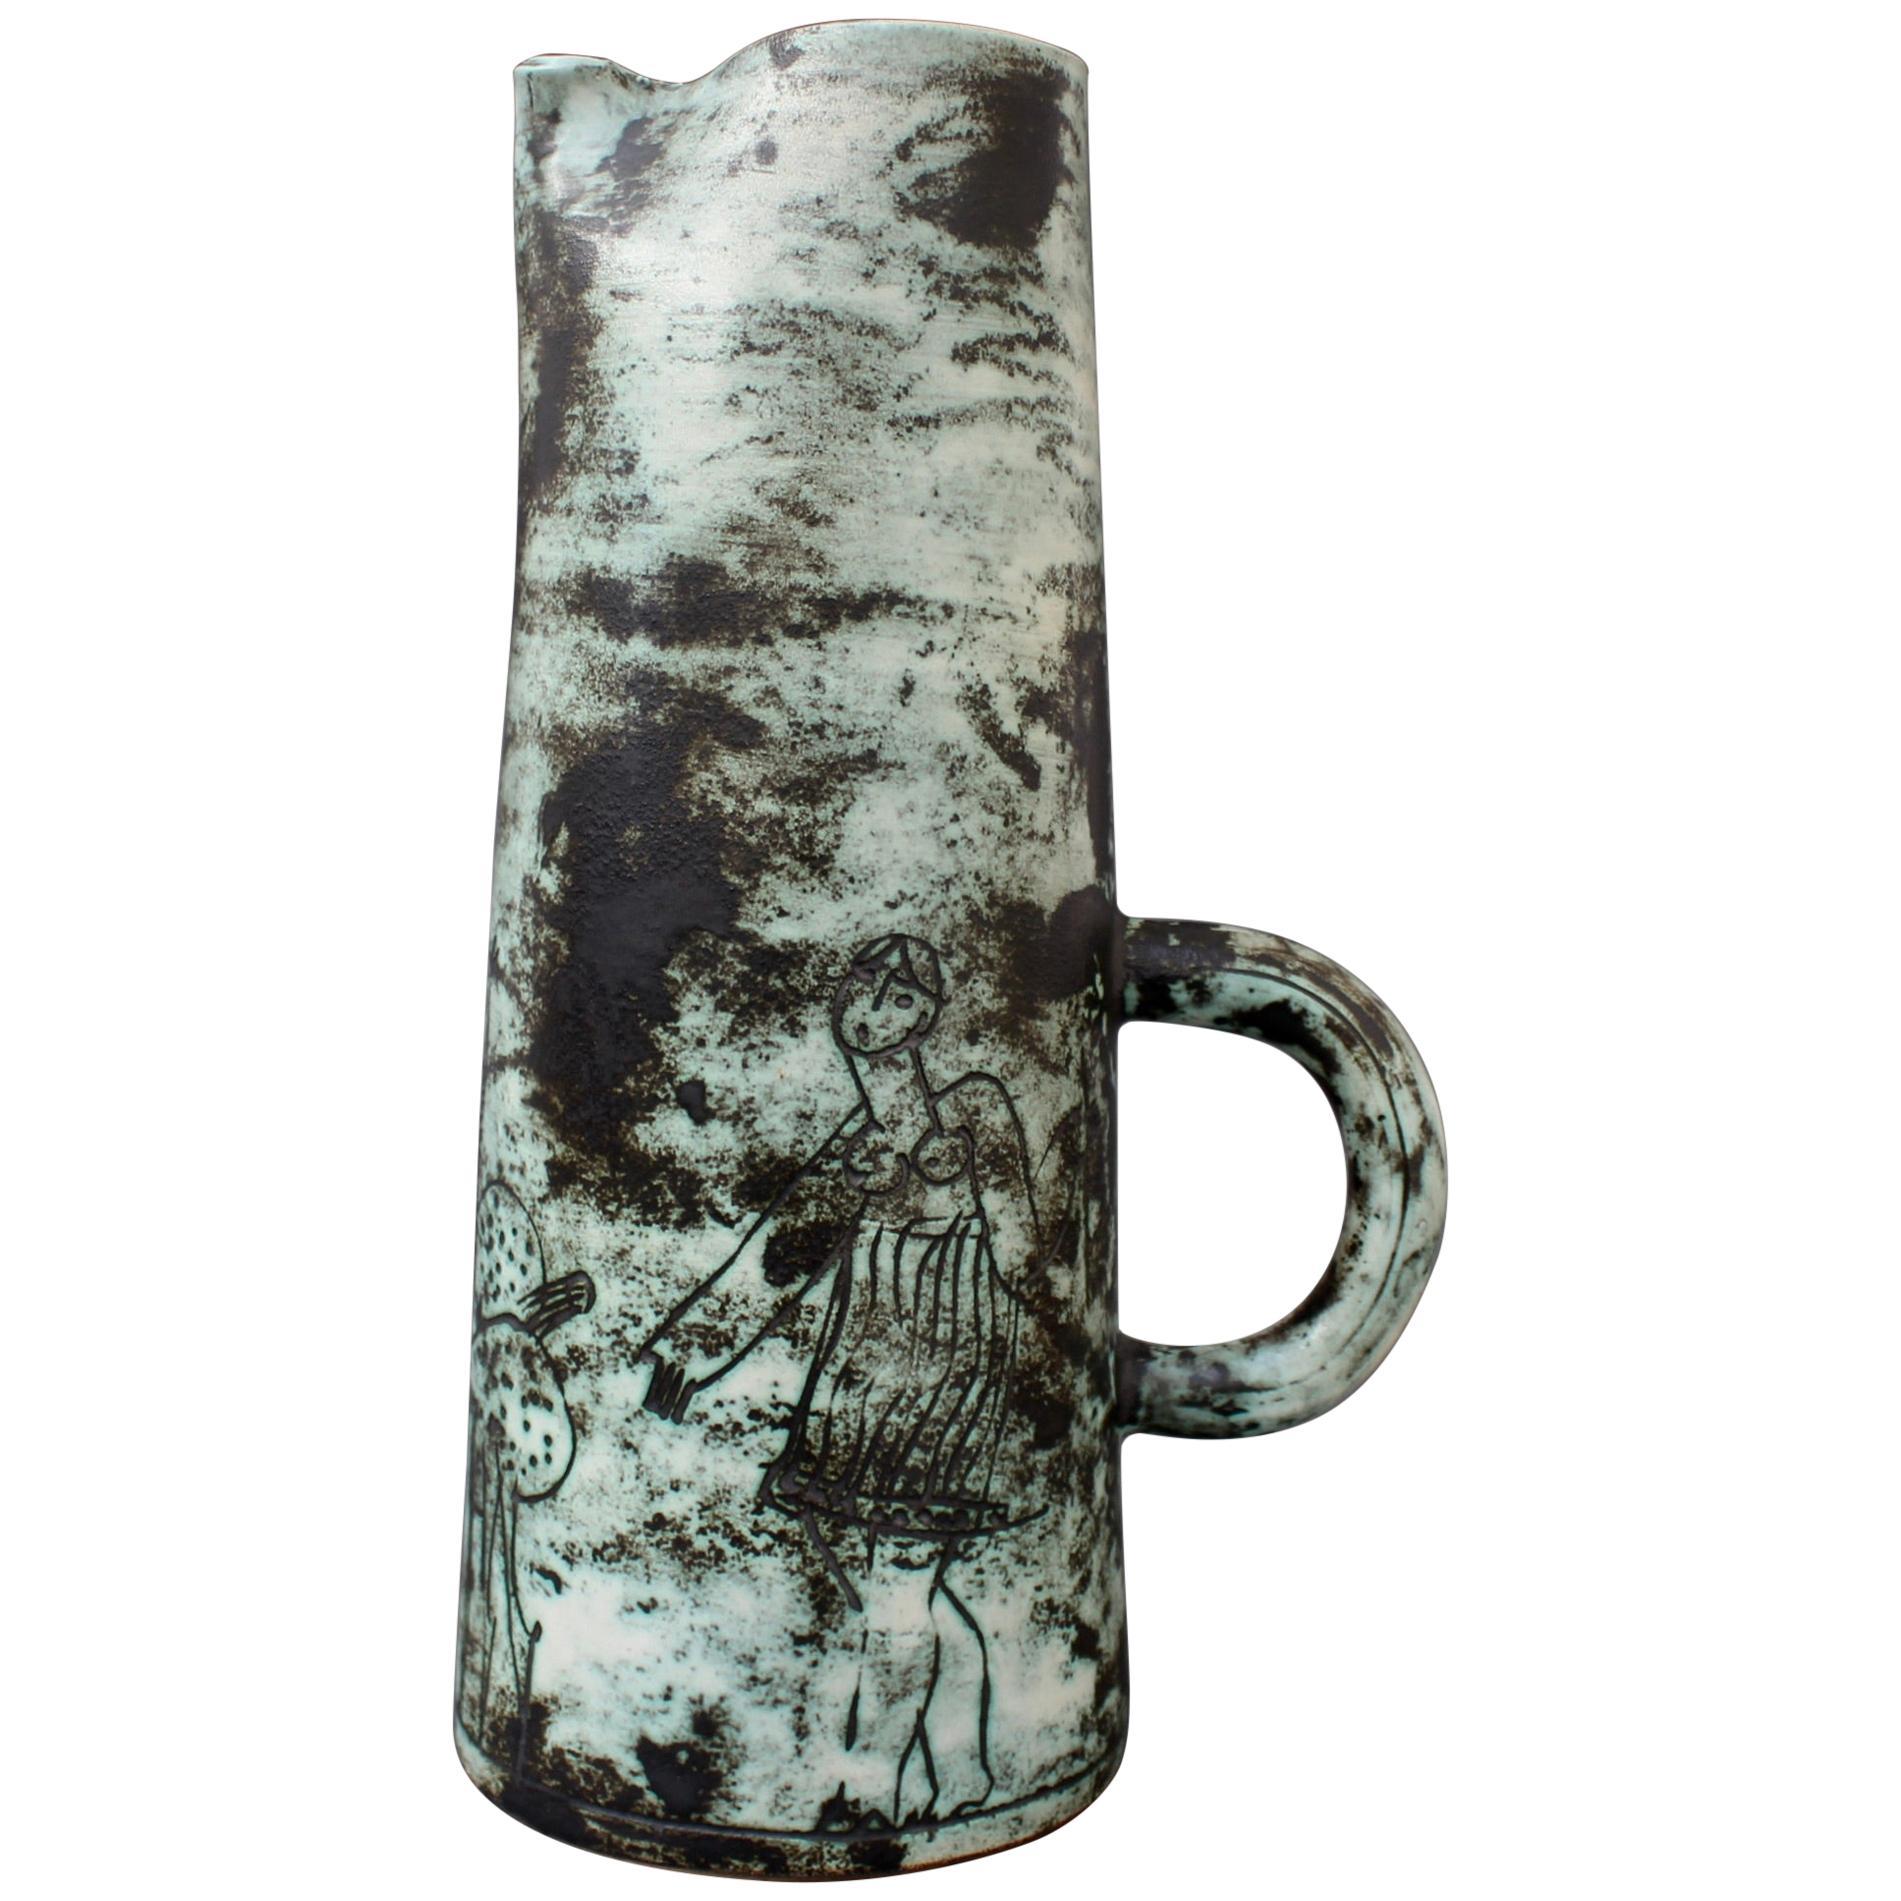 Mid-Century Ceramic Decorative Pitcher / Vase by Jacques Blin 'circa 1950s'